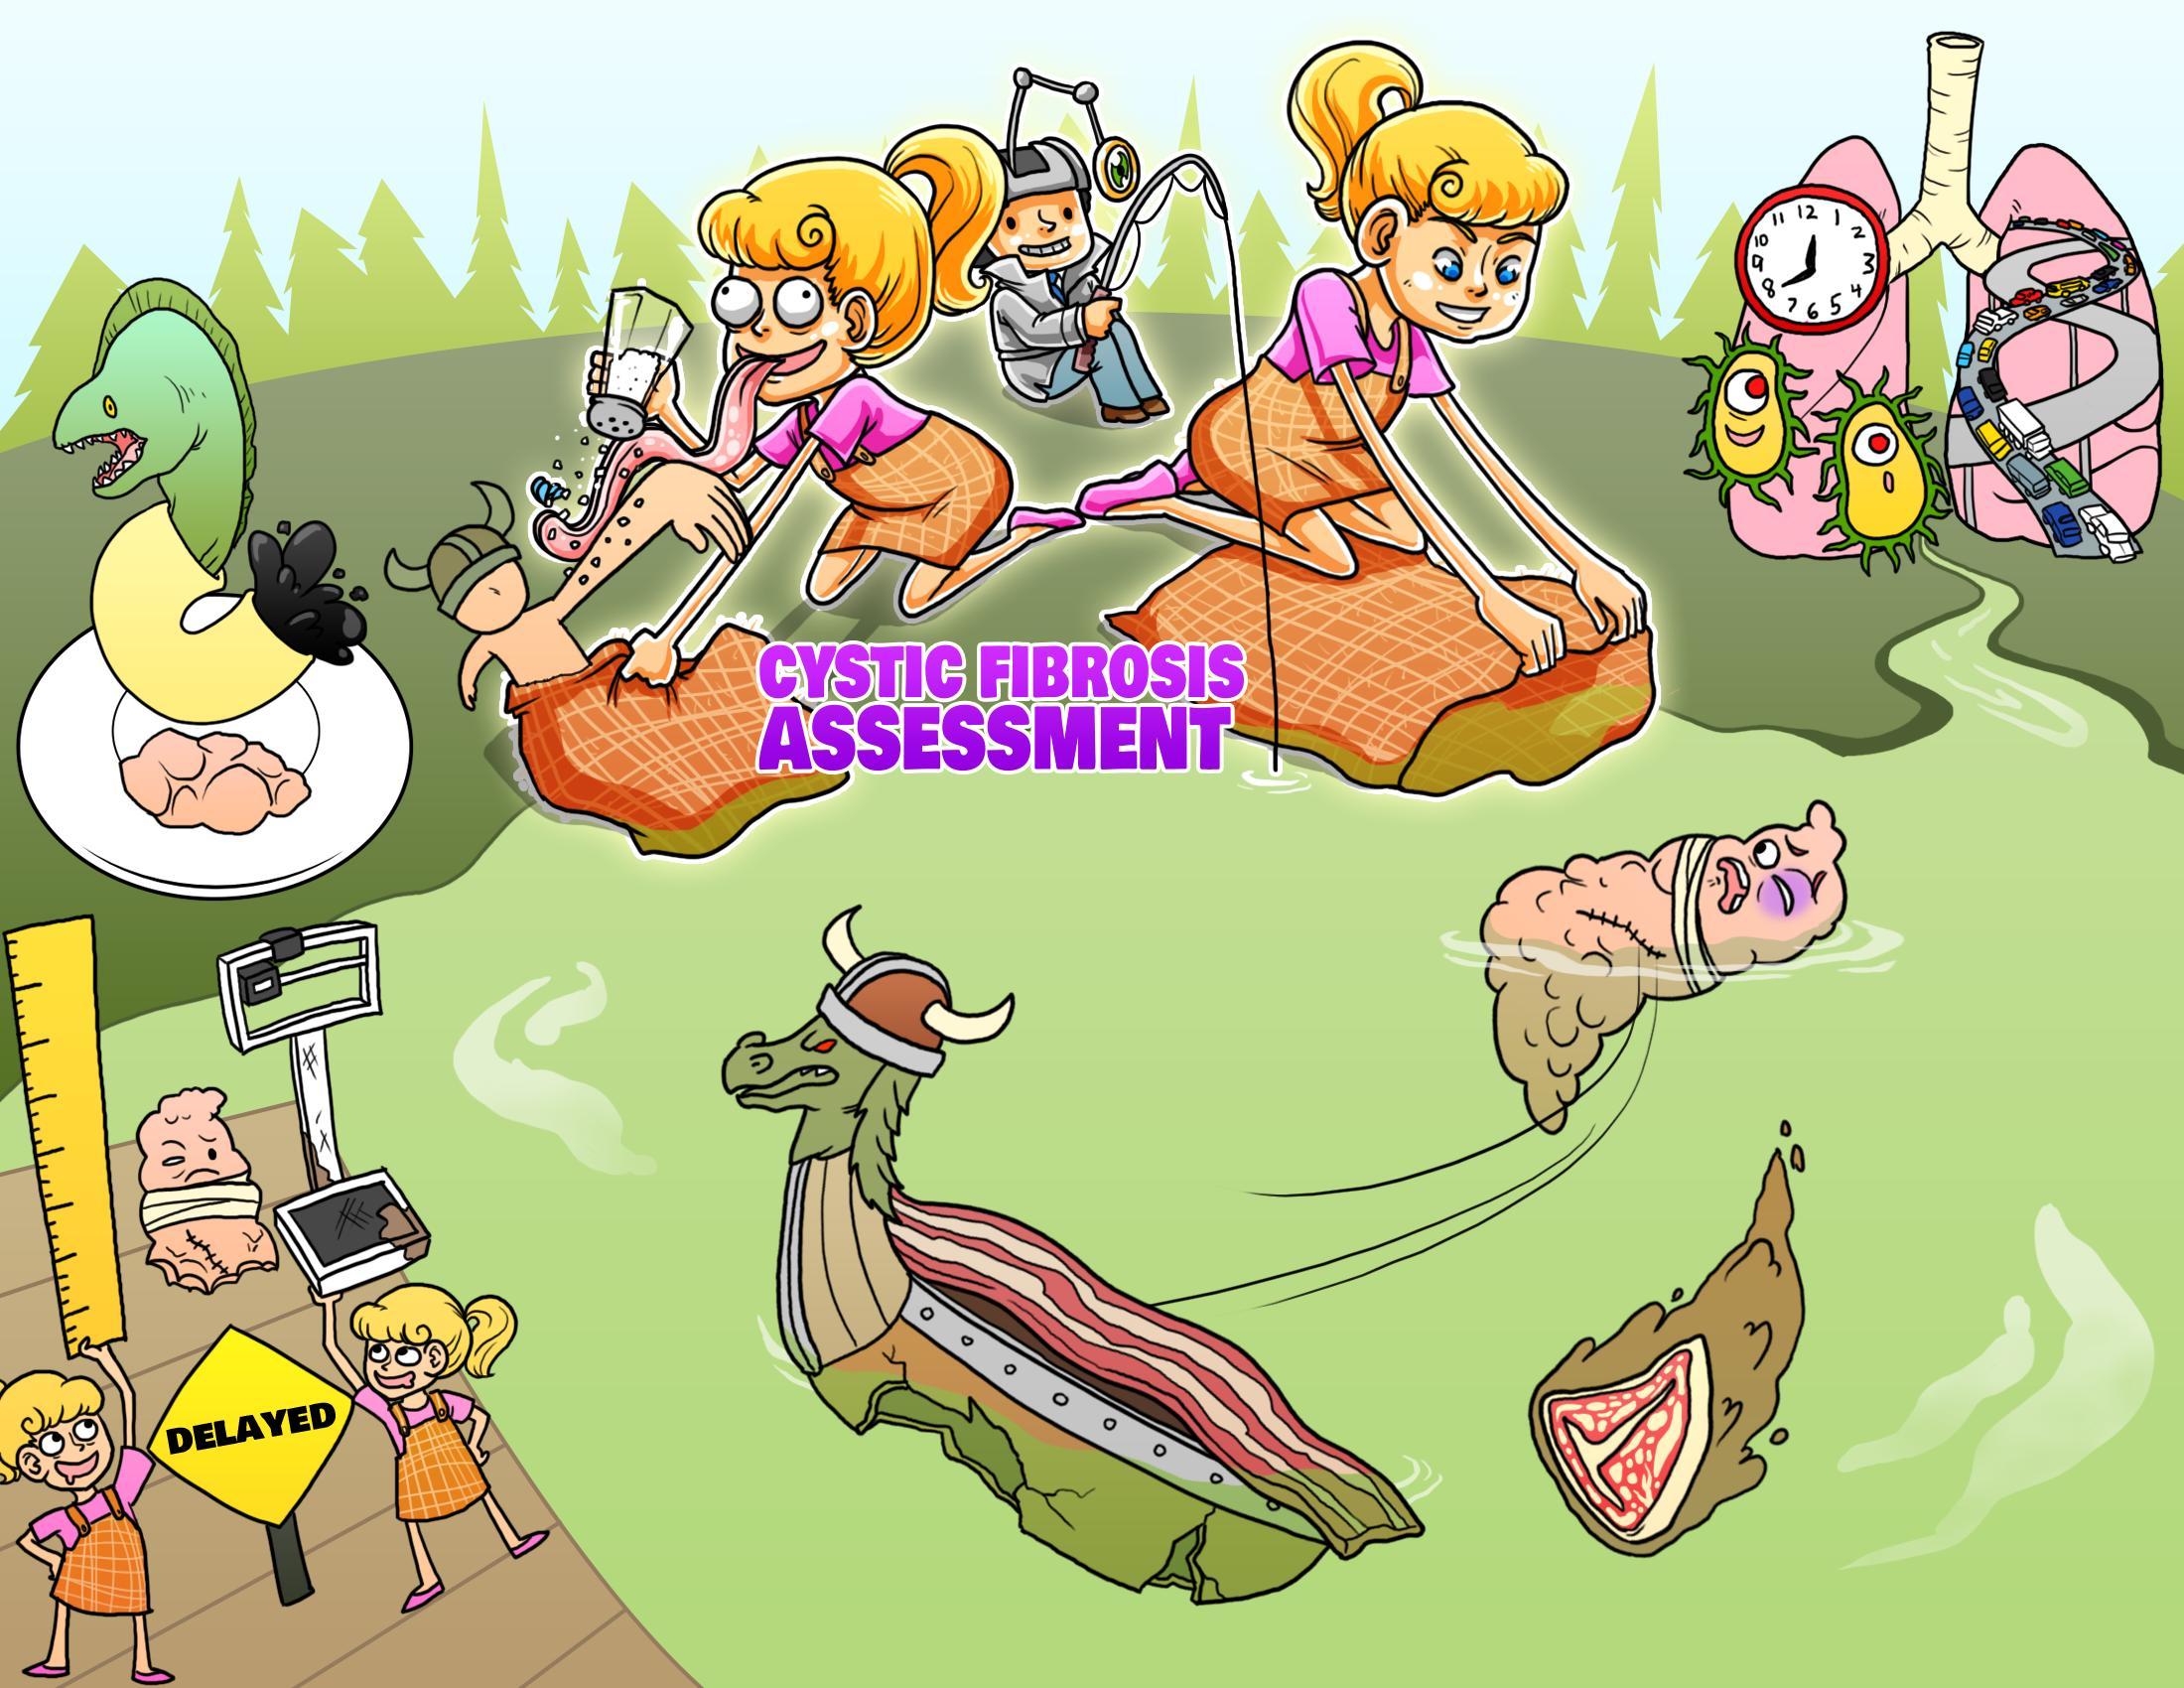 Cystic Fibrosis Assessment